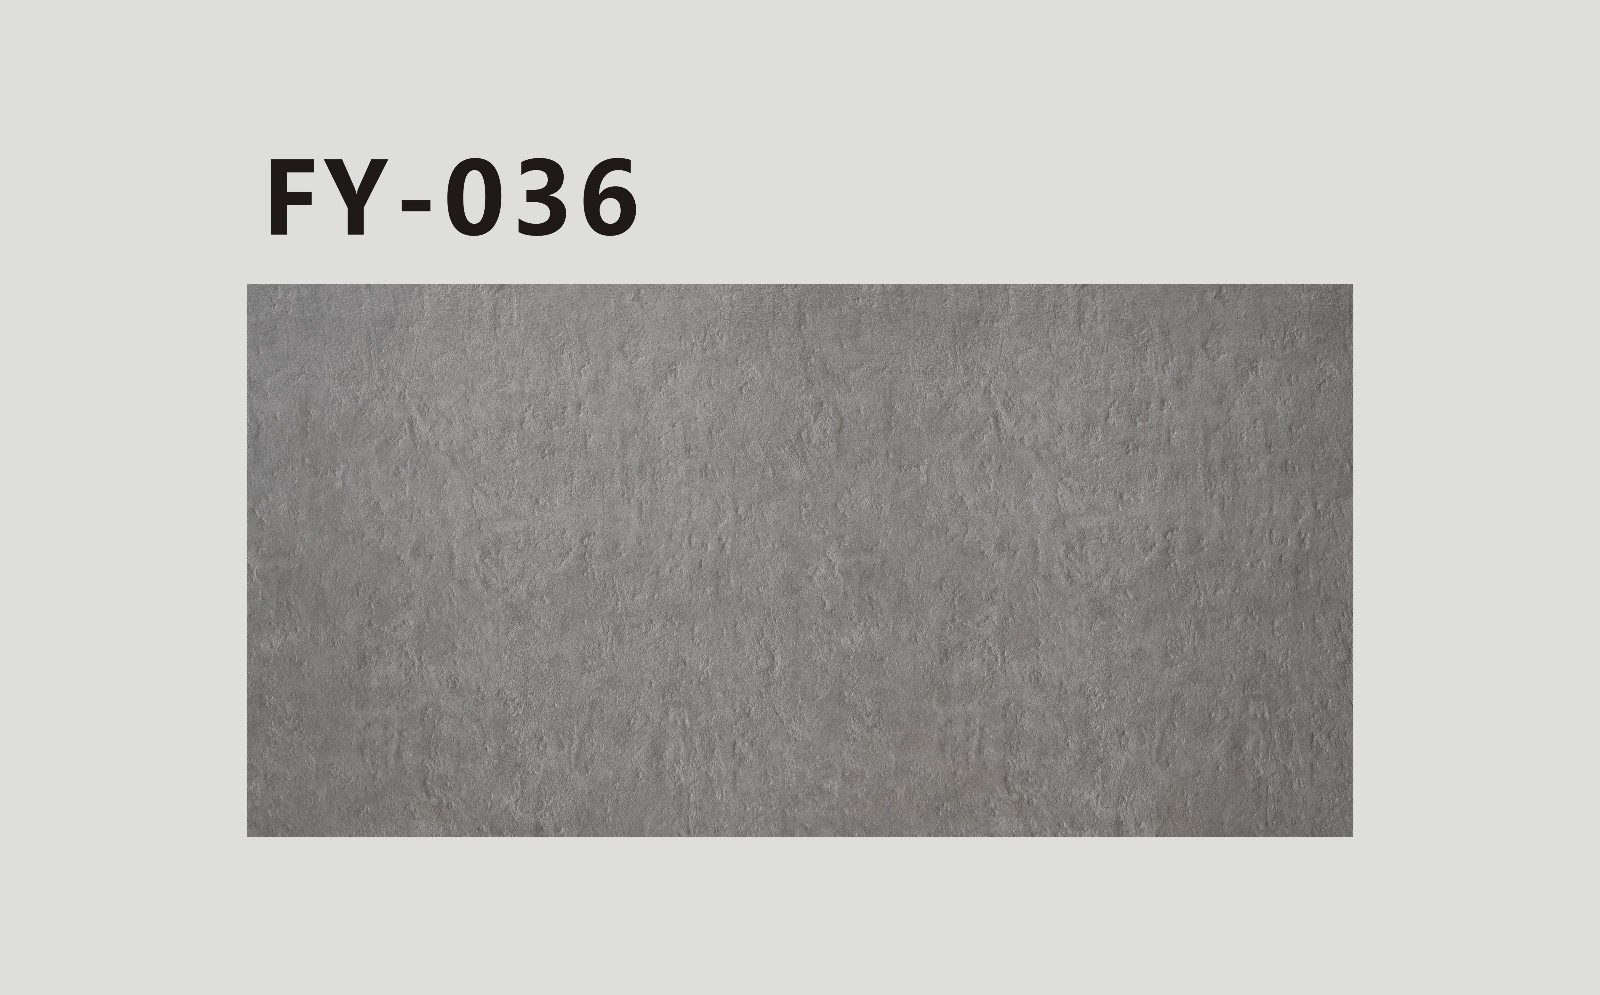 FY-036